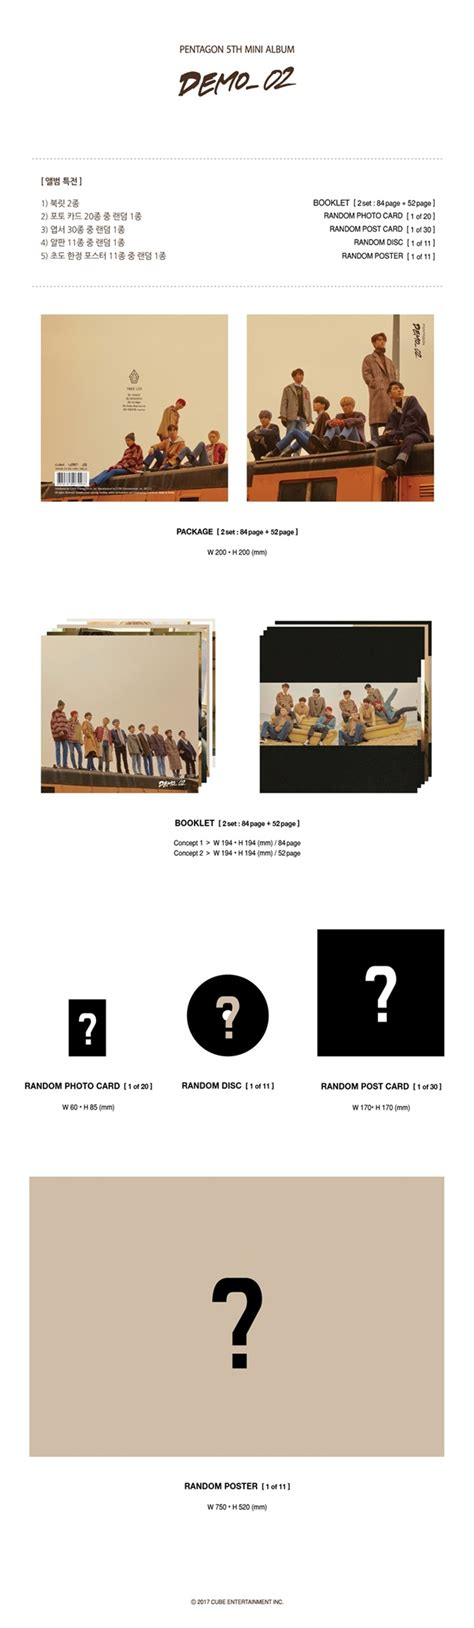 Pre Order Pentagon 4th Mini Album Demo01 pentagon 5th mini album demo 02 cd poster